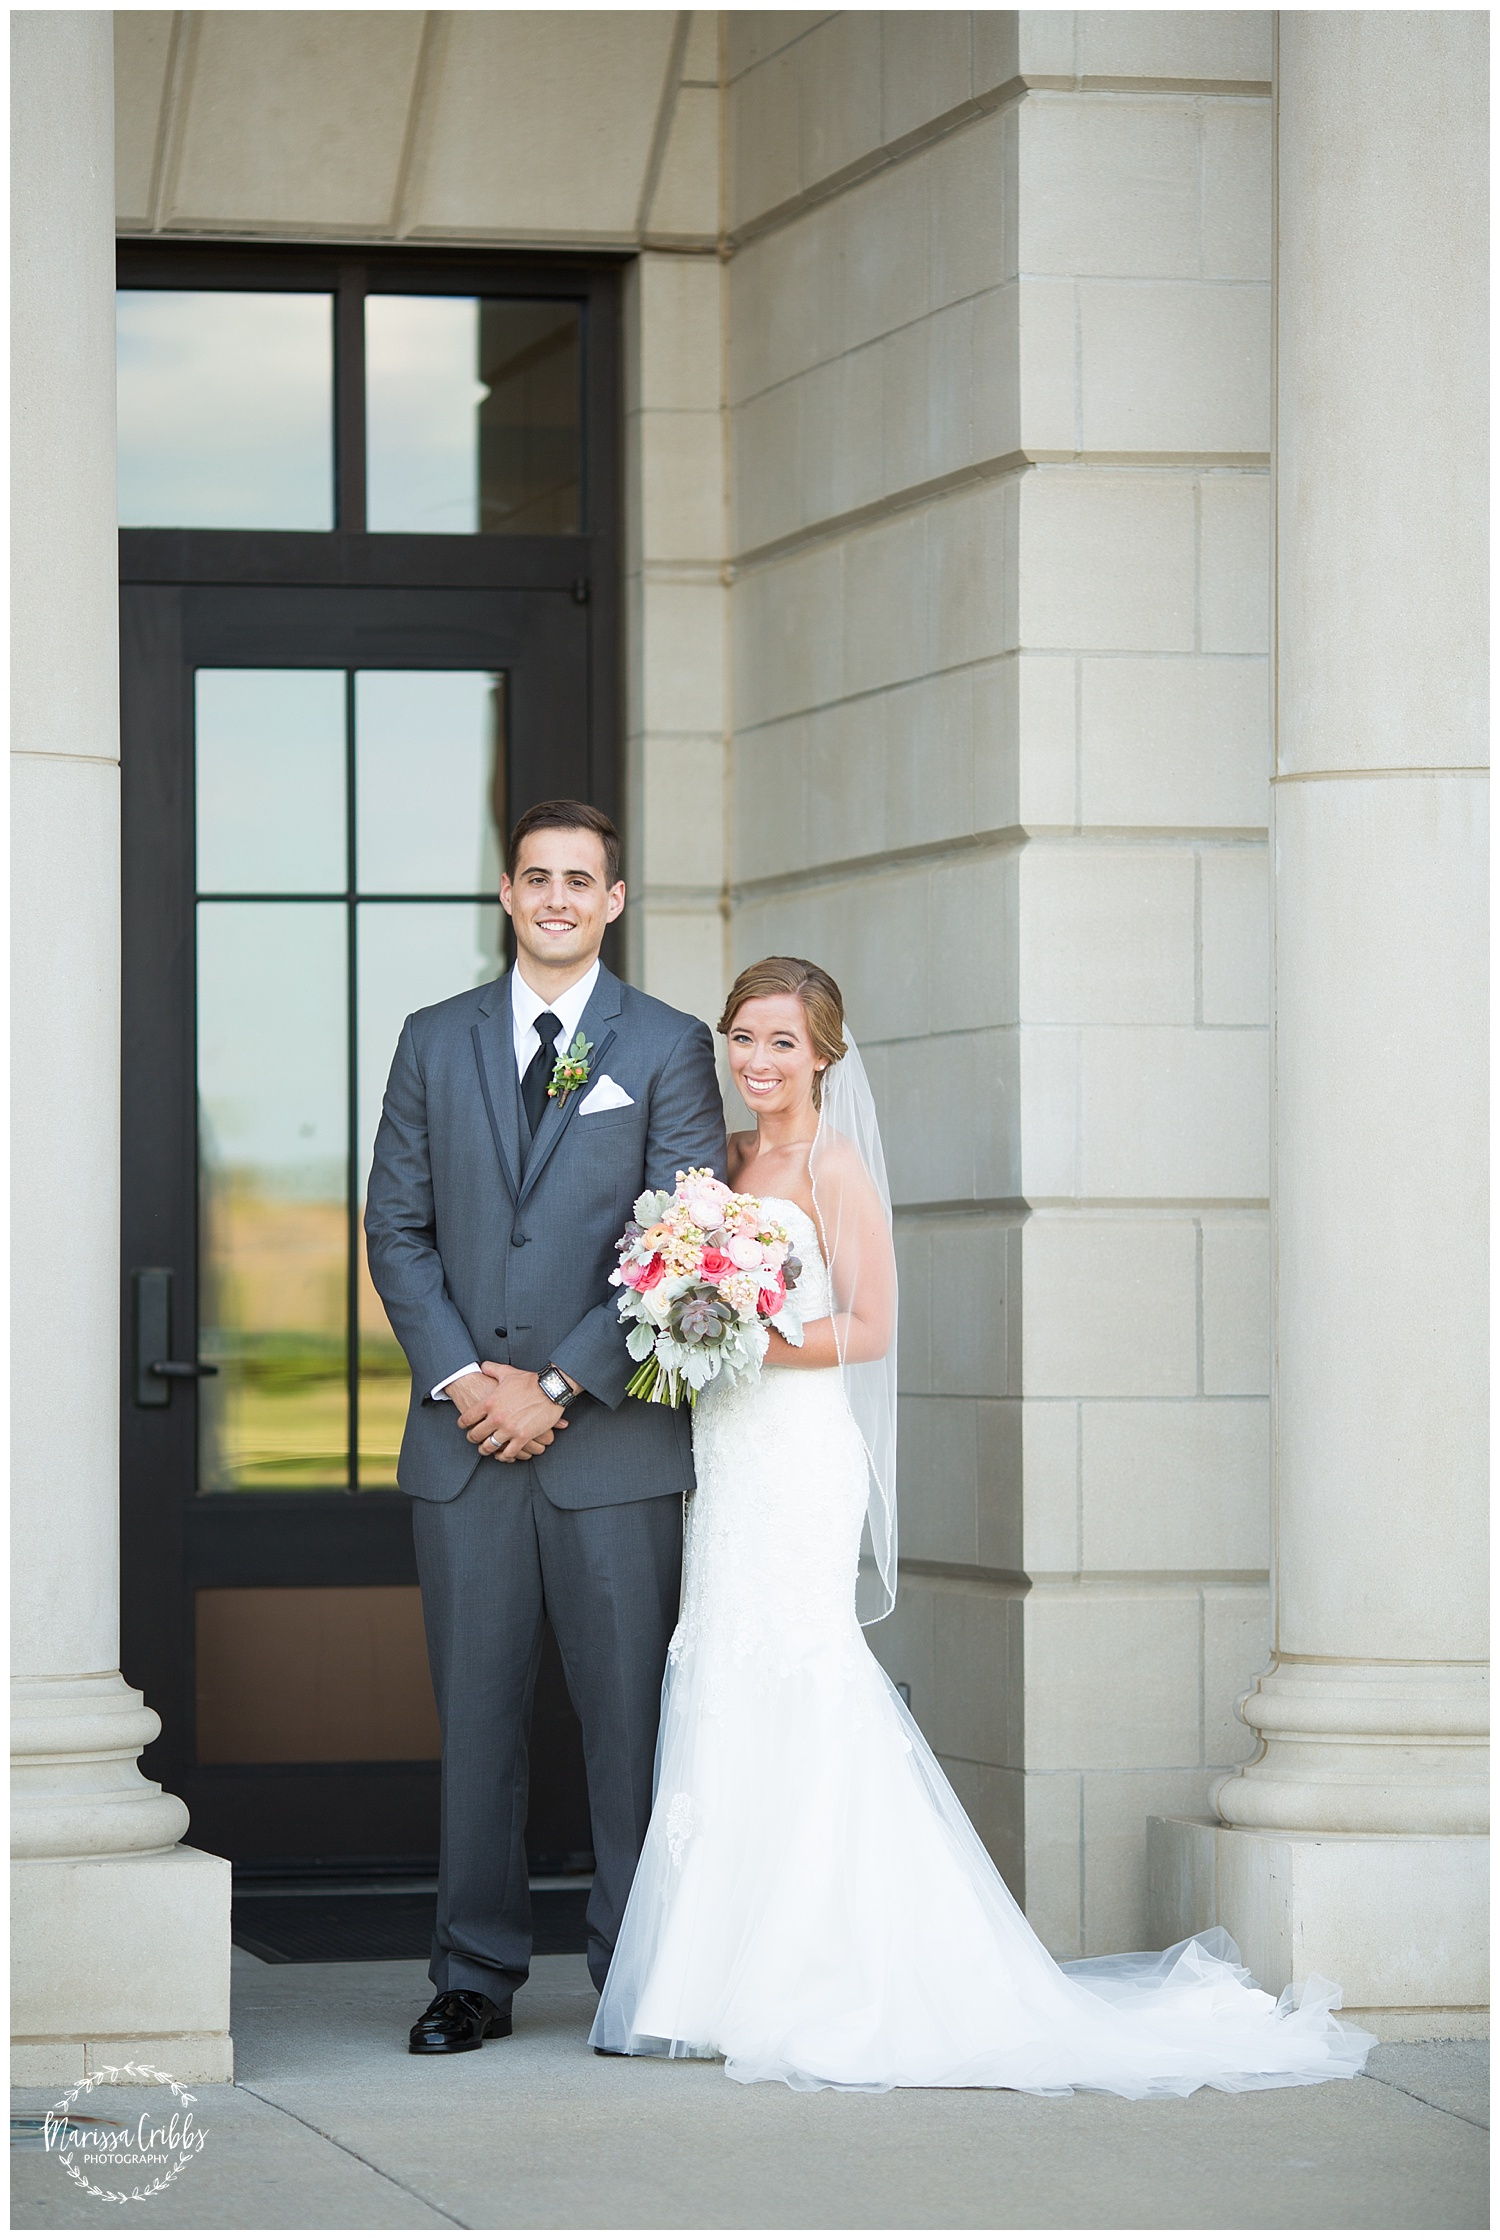 Twin Double Wedding | Union Horse Distilling Co. | Marissa Cribbs Photography | KC Weddings_0107.jpg